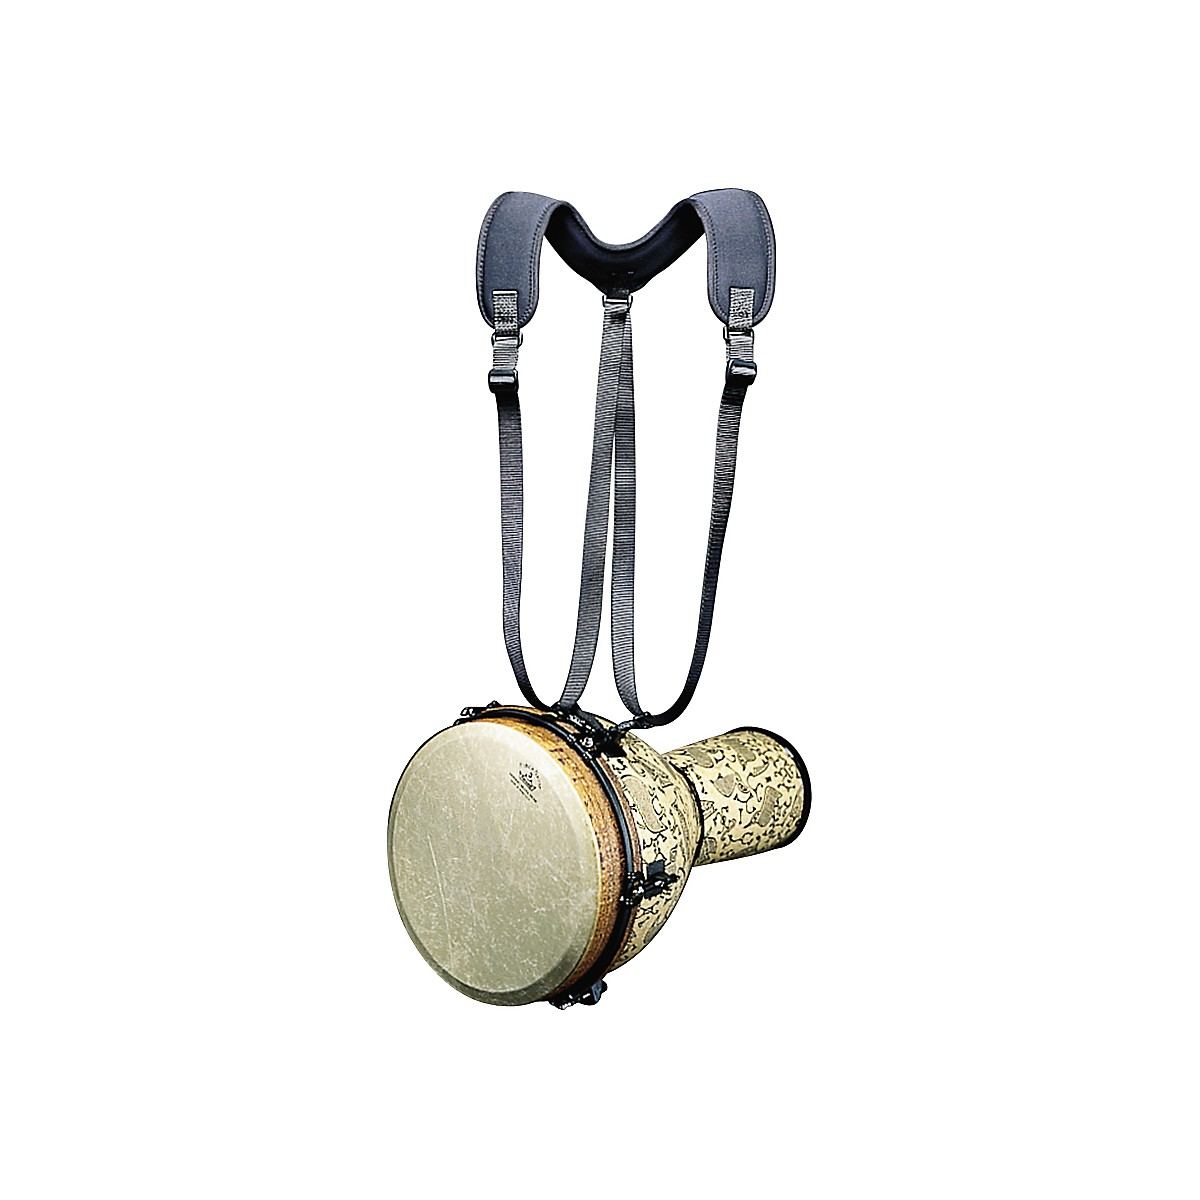 Neotech Percussion Strap